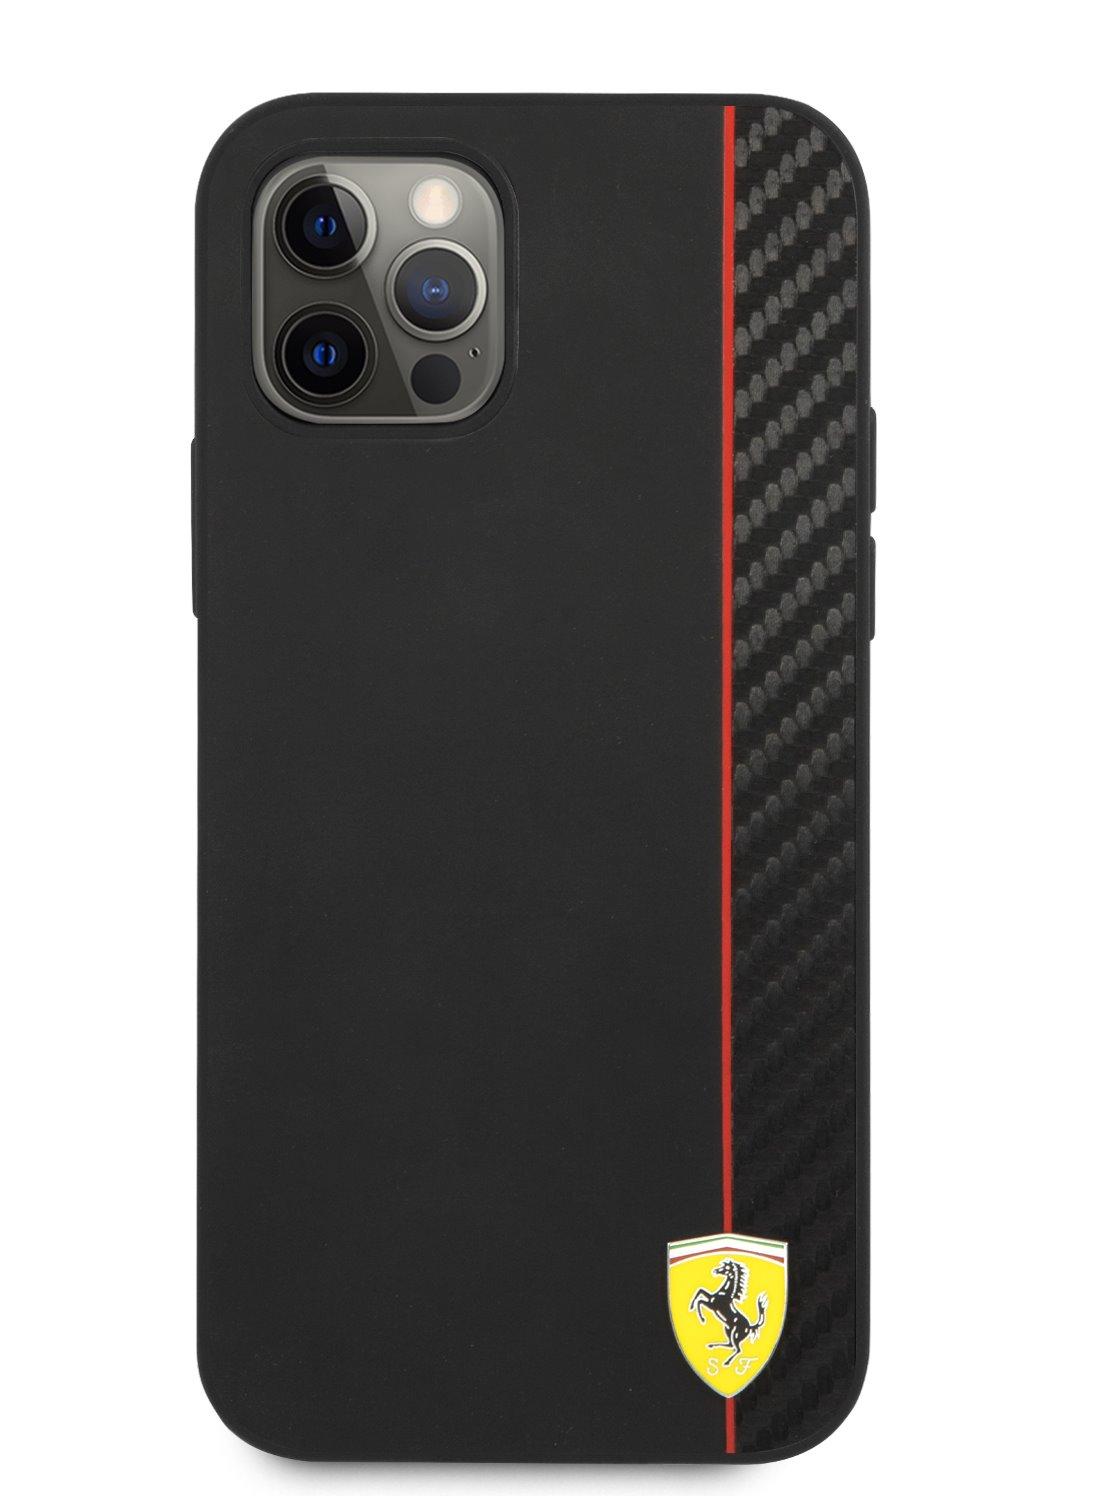 FESAXHCP12LBK Ferrari On Track Stripe Carbon Zadní Kryt pro iPhone 12 Pro Max 6.7 Black 3700740499443